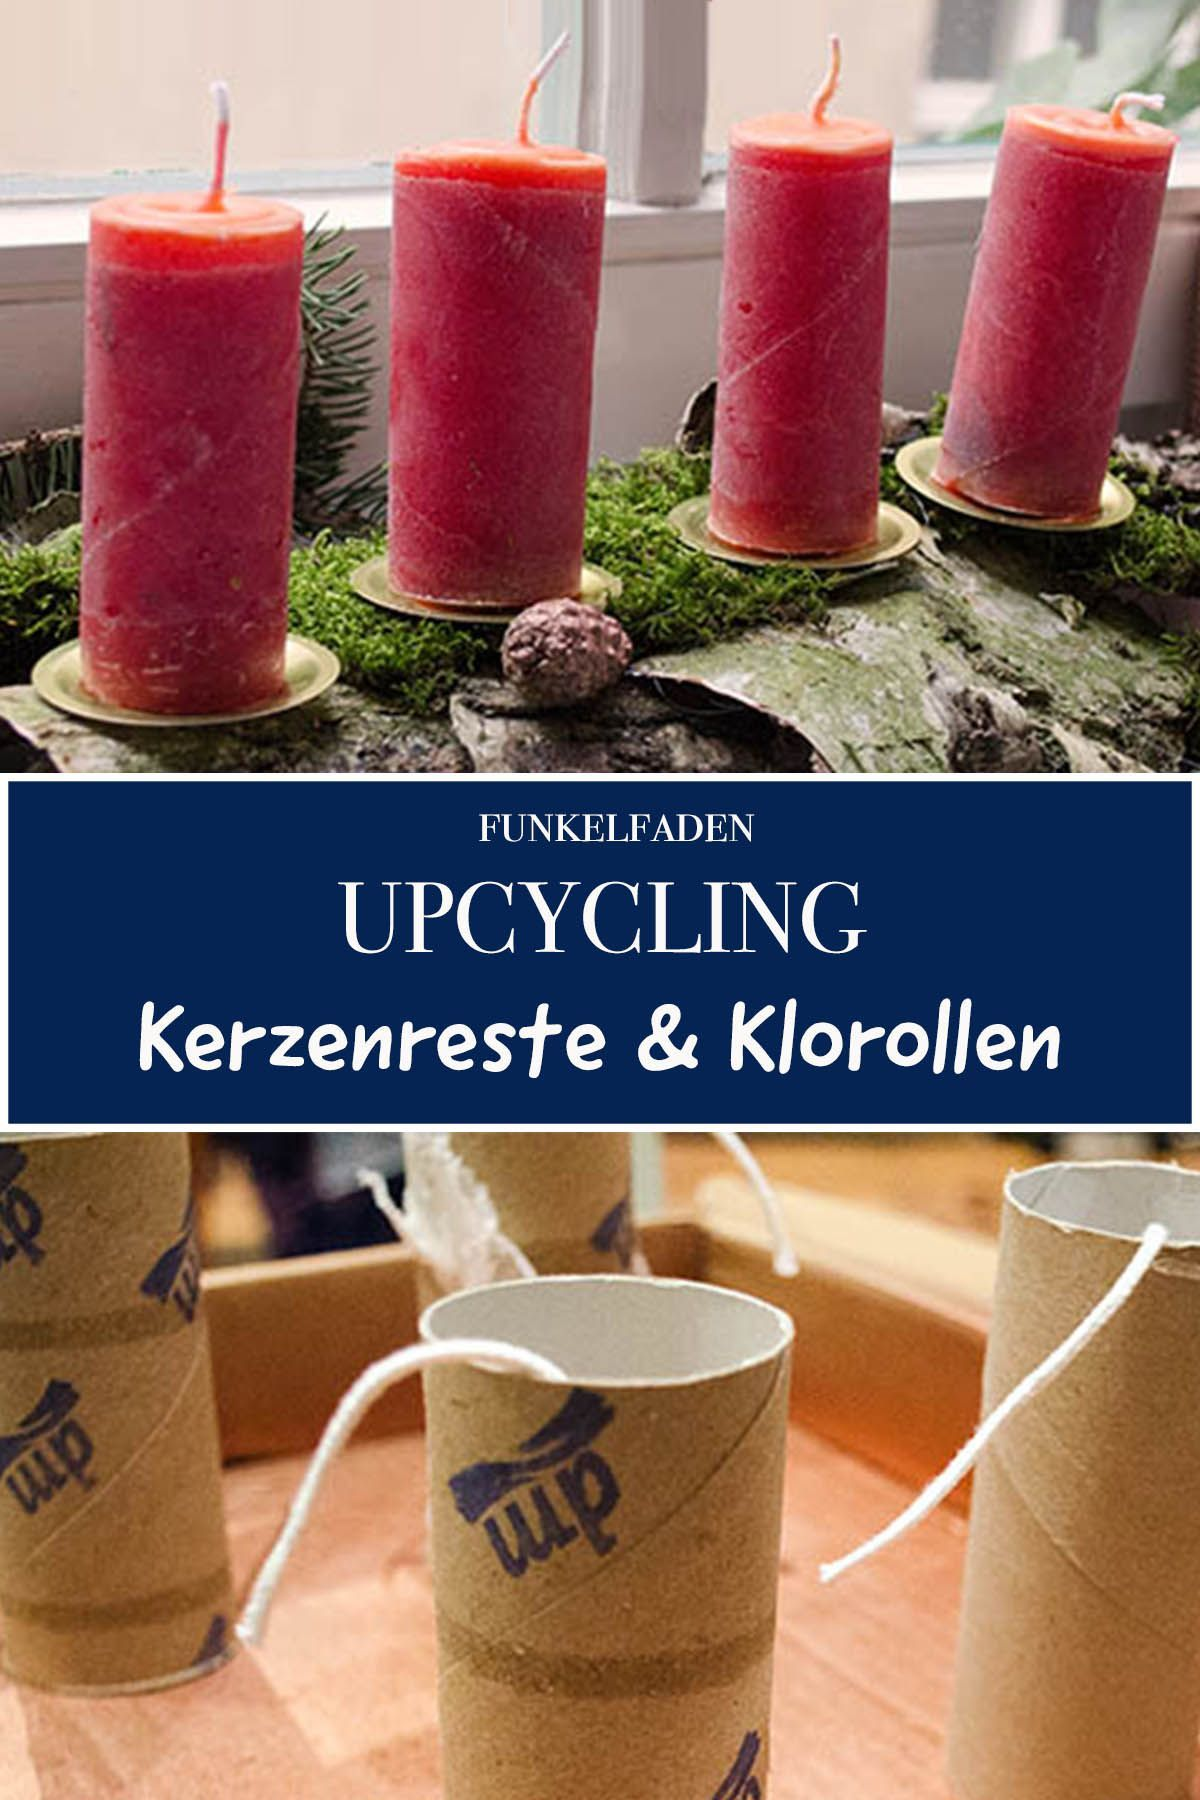 Anleitung – Upcycling Kerzen aus Kerzenabfällen und Rollenrollen für Heimwerker – UPCYCLING IDEEN